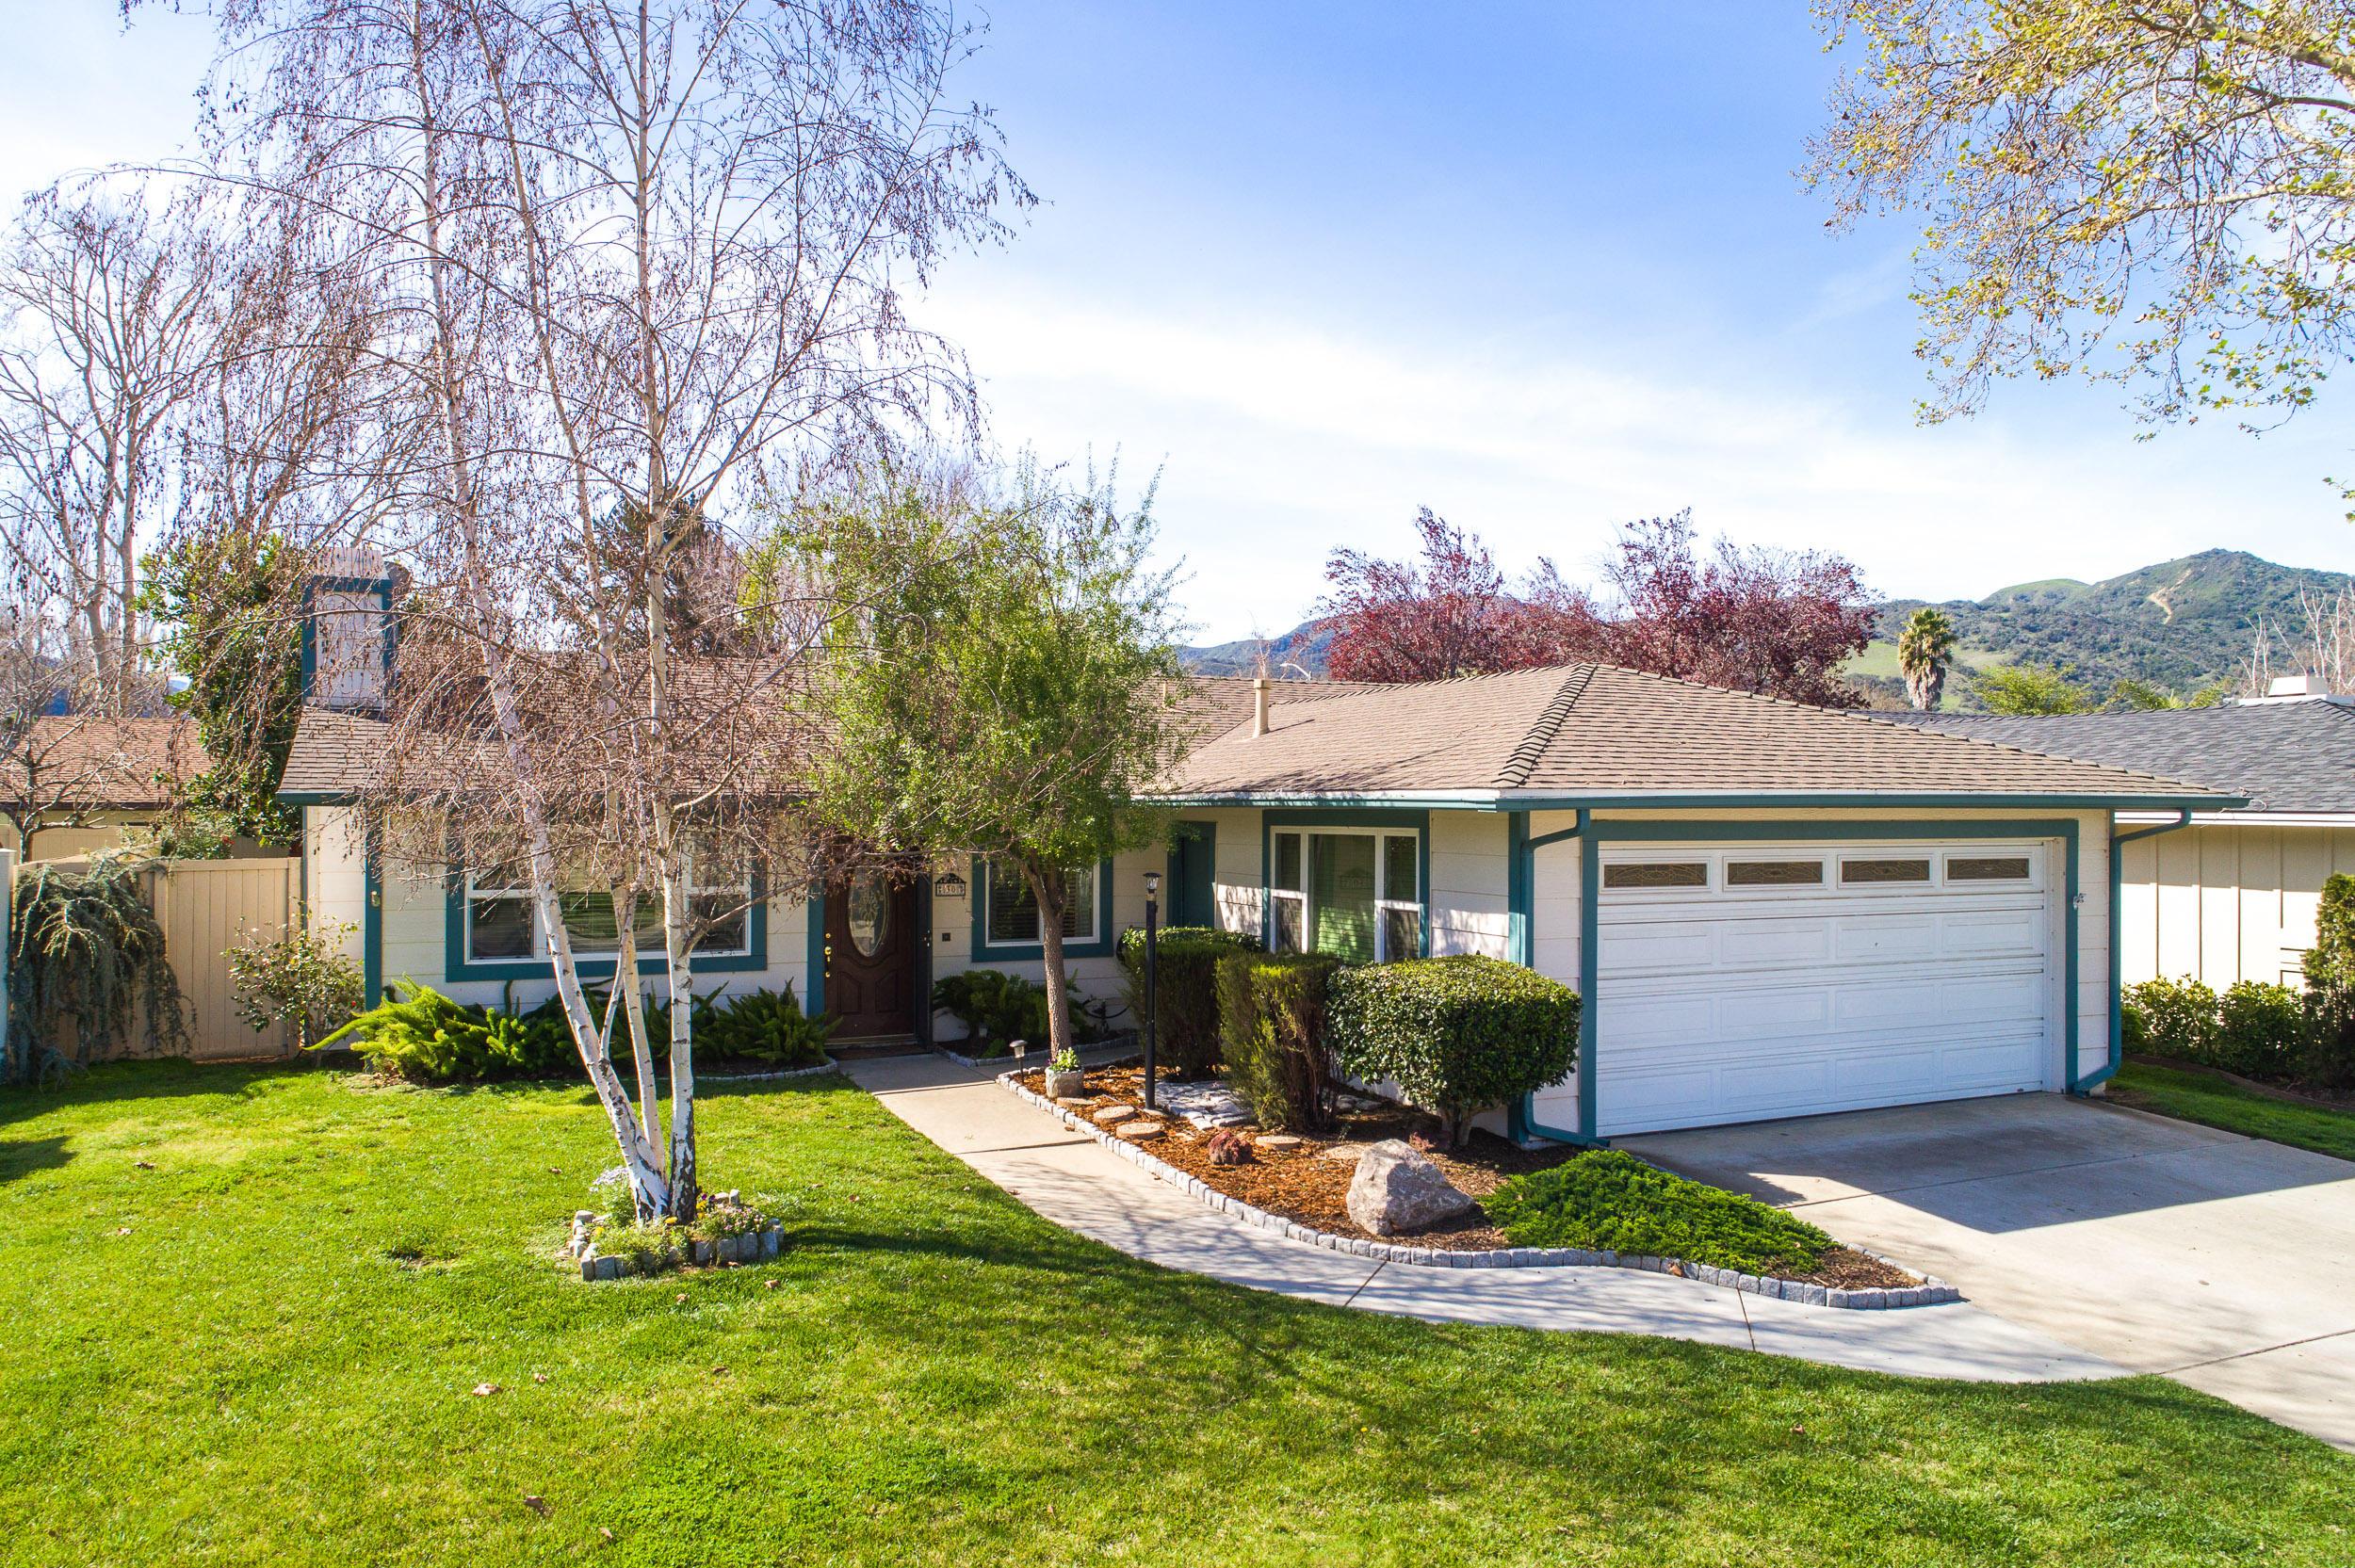 Property photo for 30 Bear Creek Dr Buellton, California 93427 - 18-1120